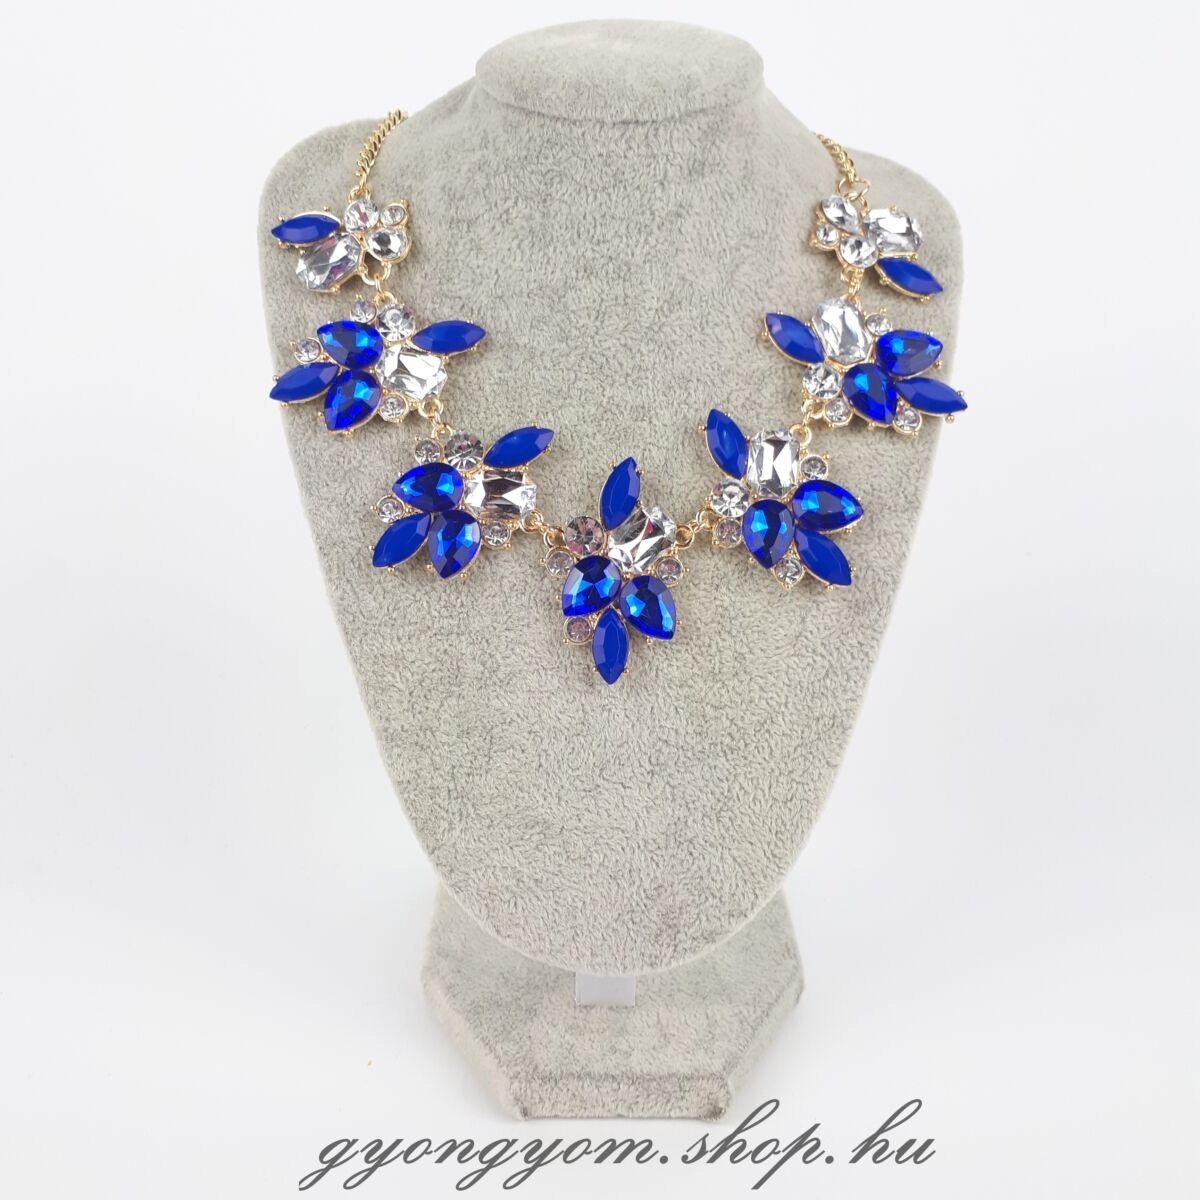 Kisa kék nyaklánc